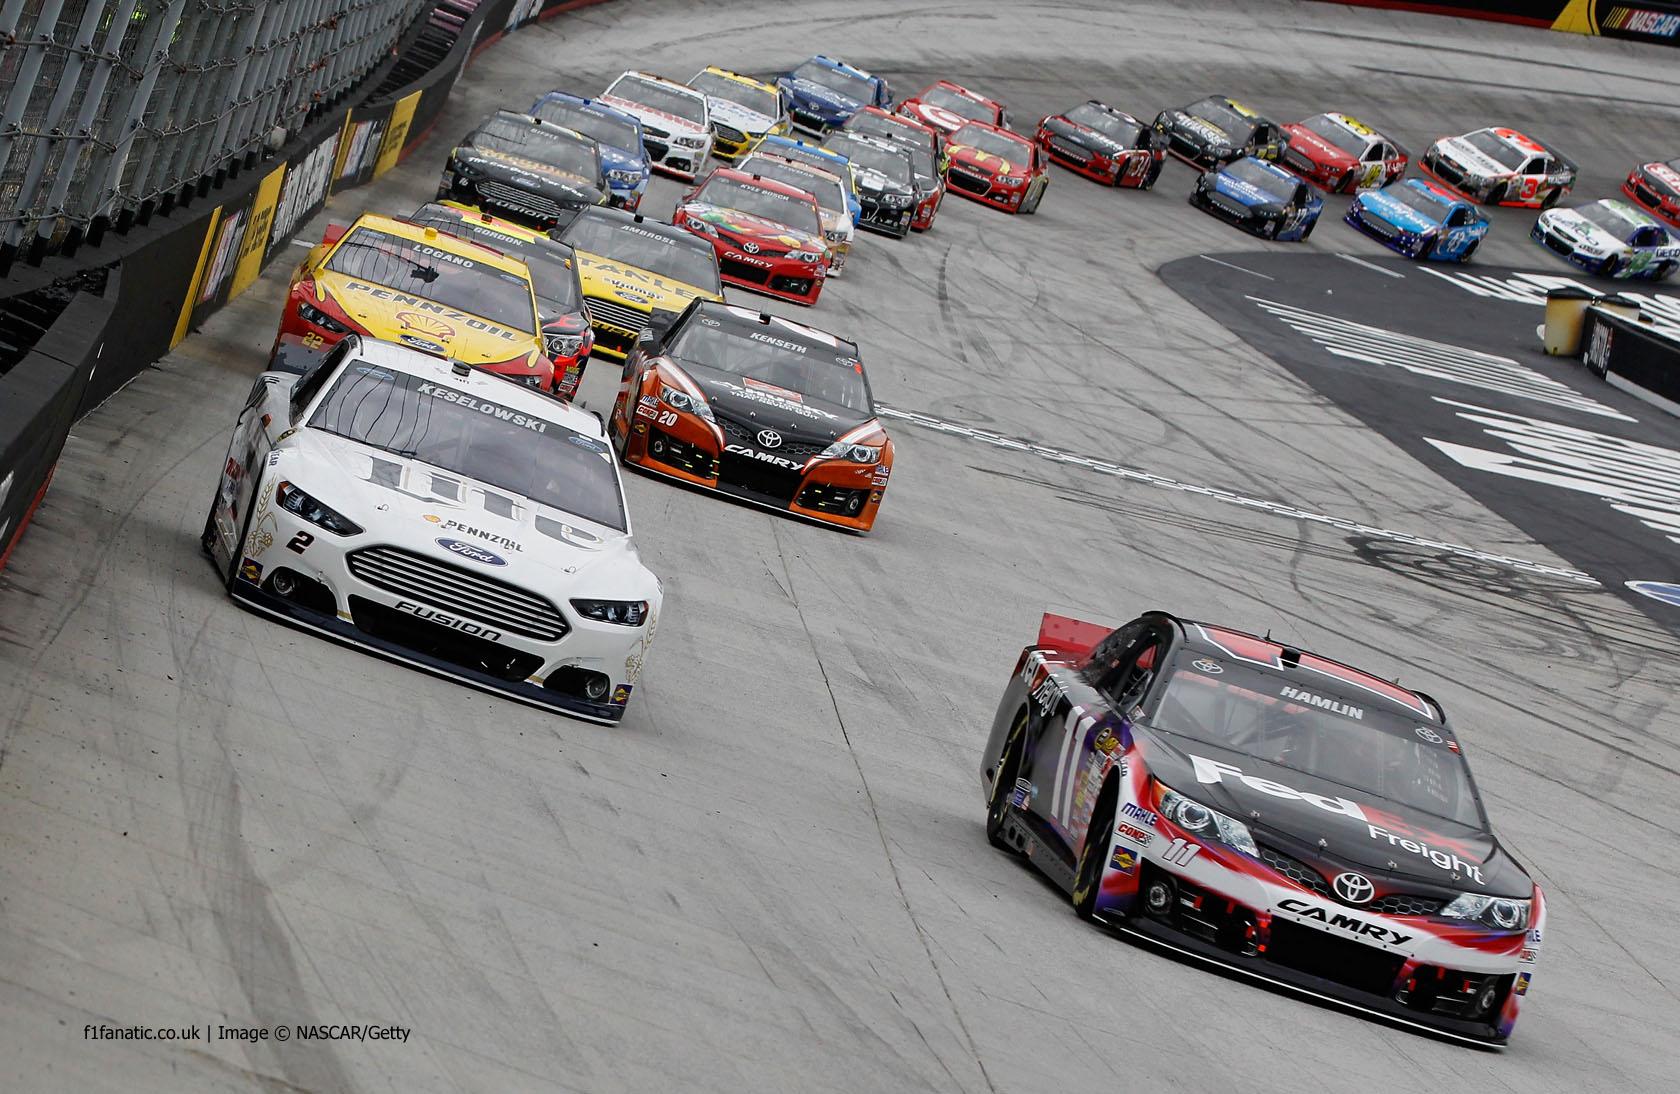 Brad Keselowski, Denny Hamlin, Bristol, NASCAR, 2014